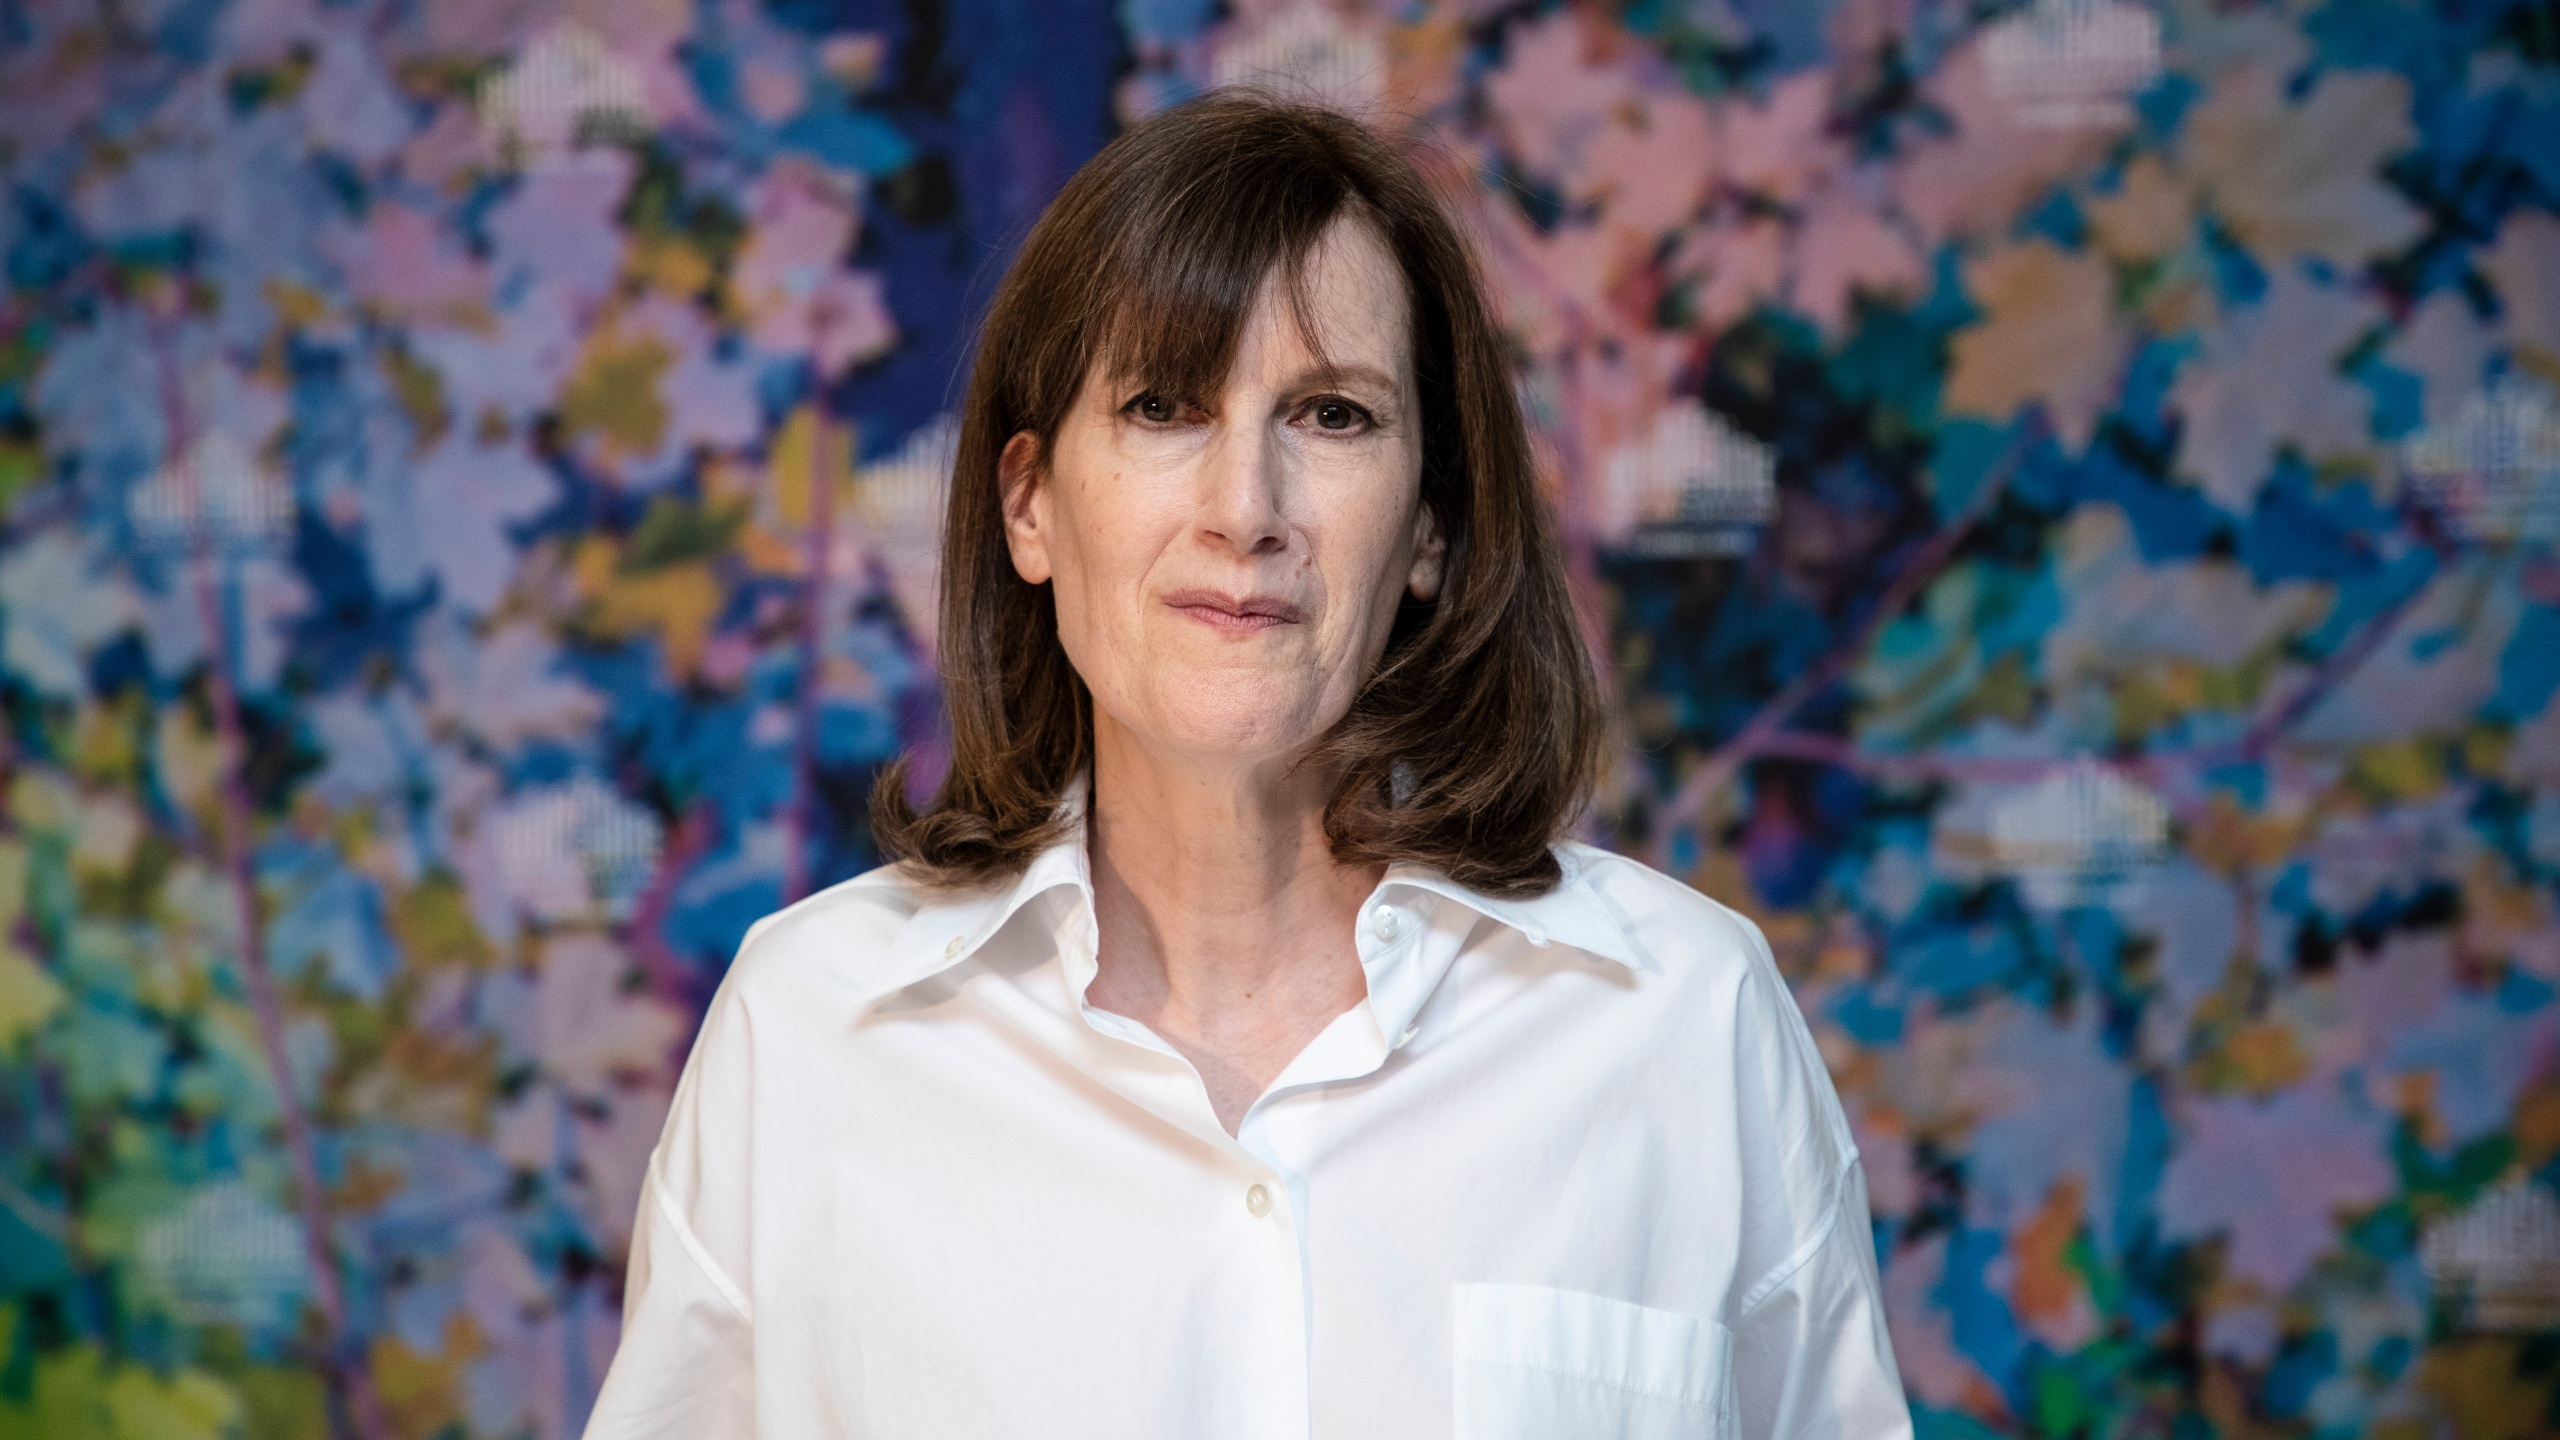 Joanna Hogg